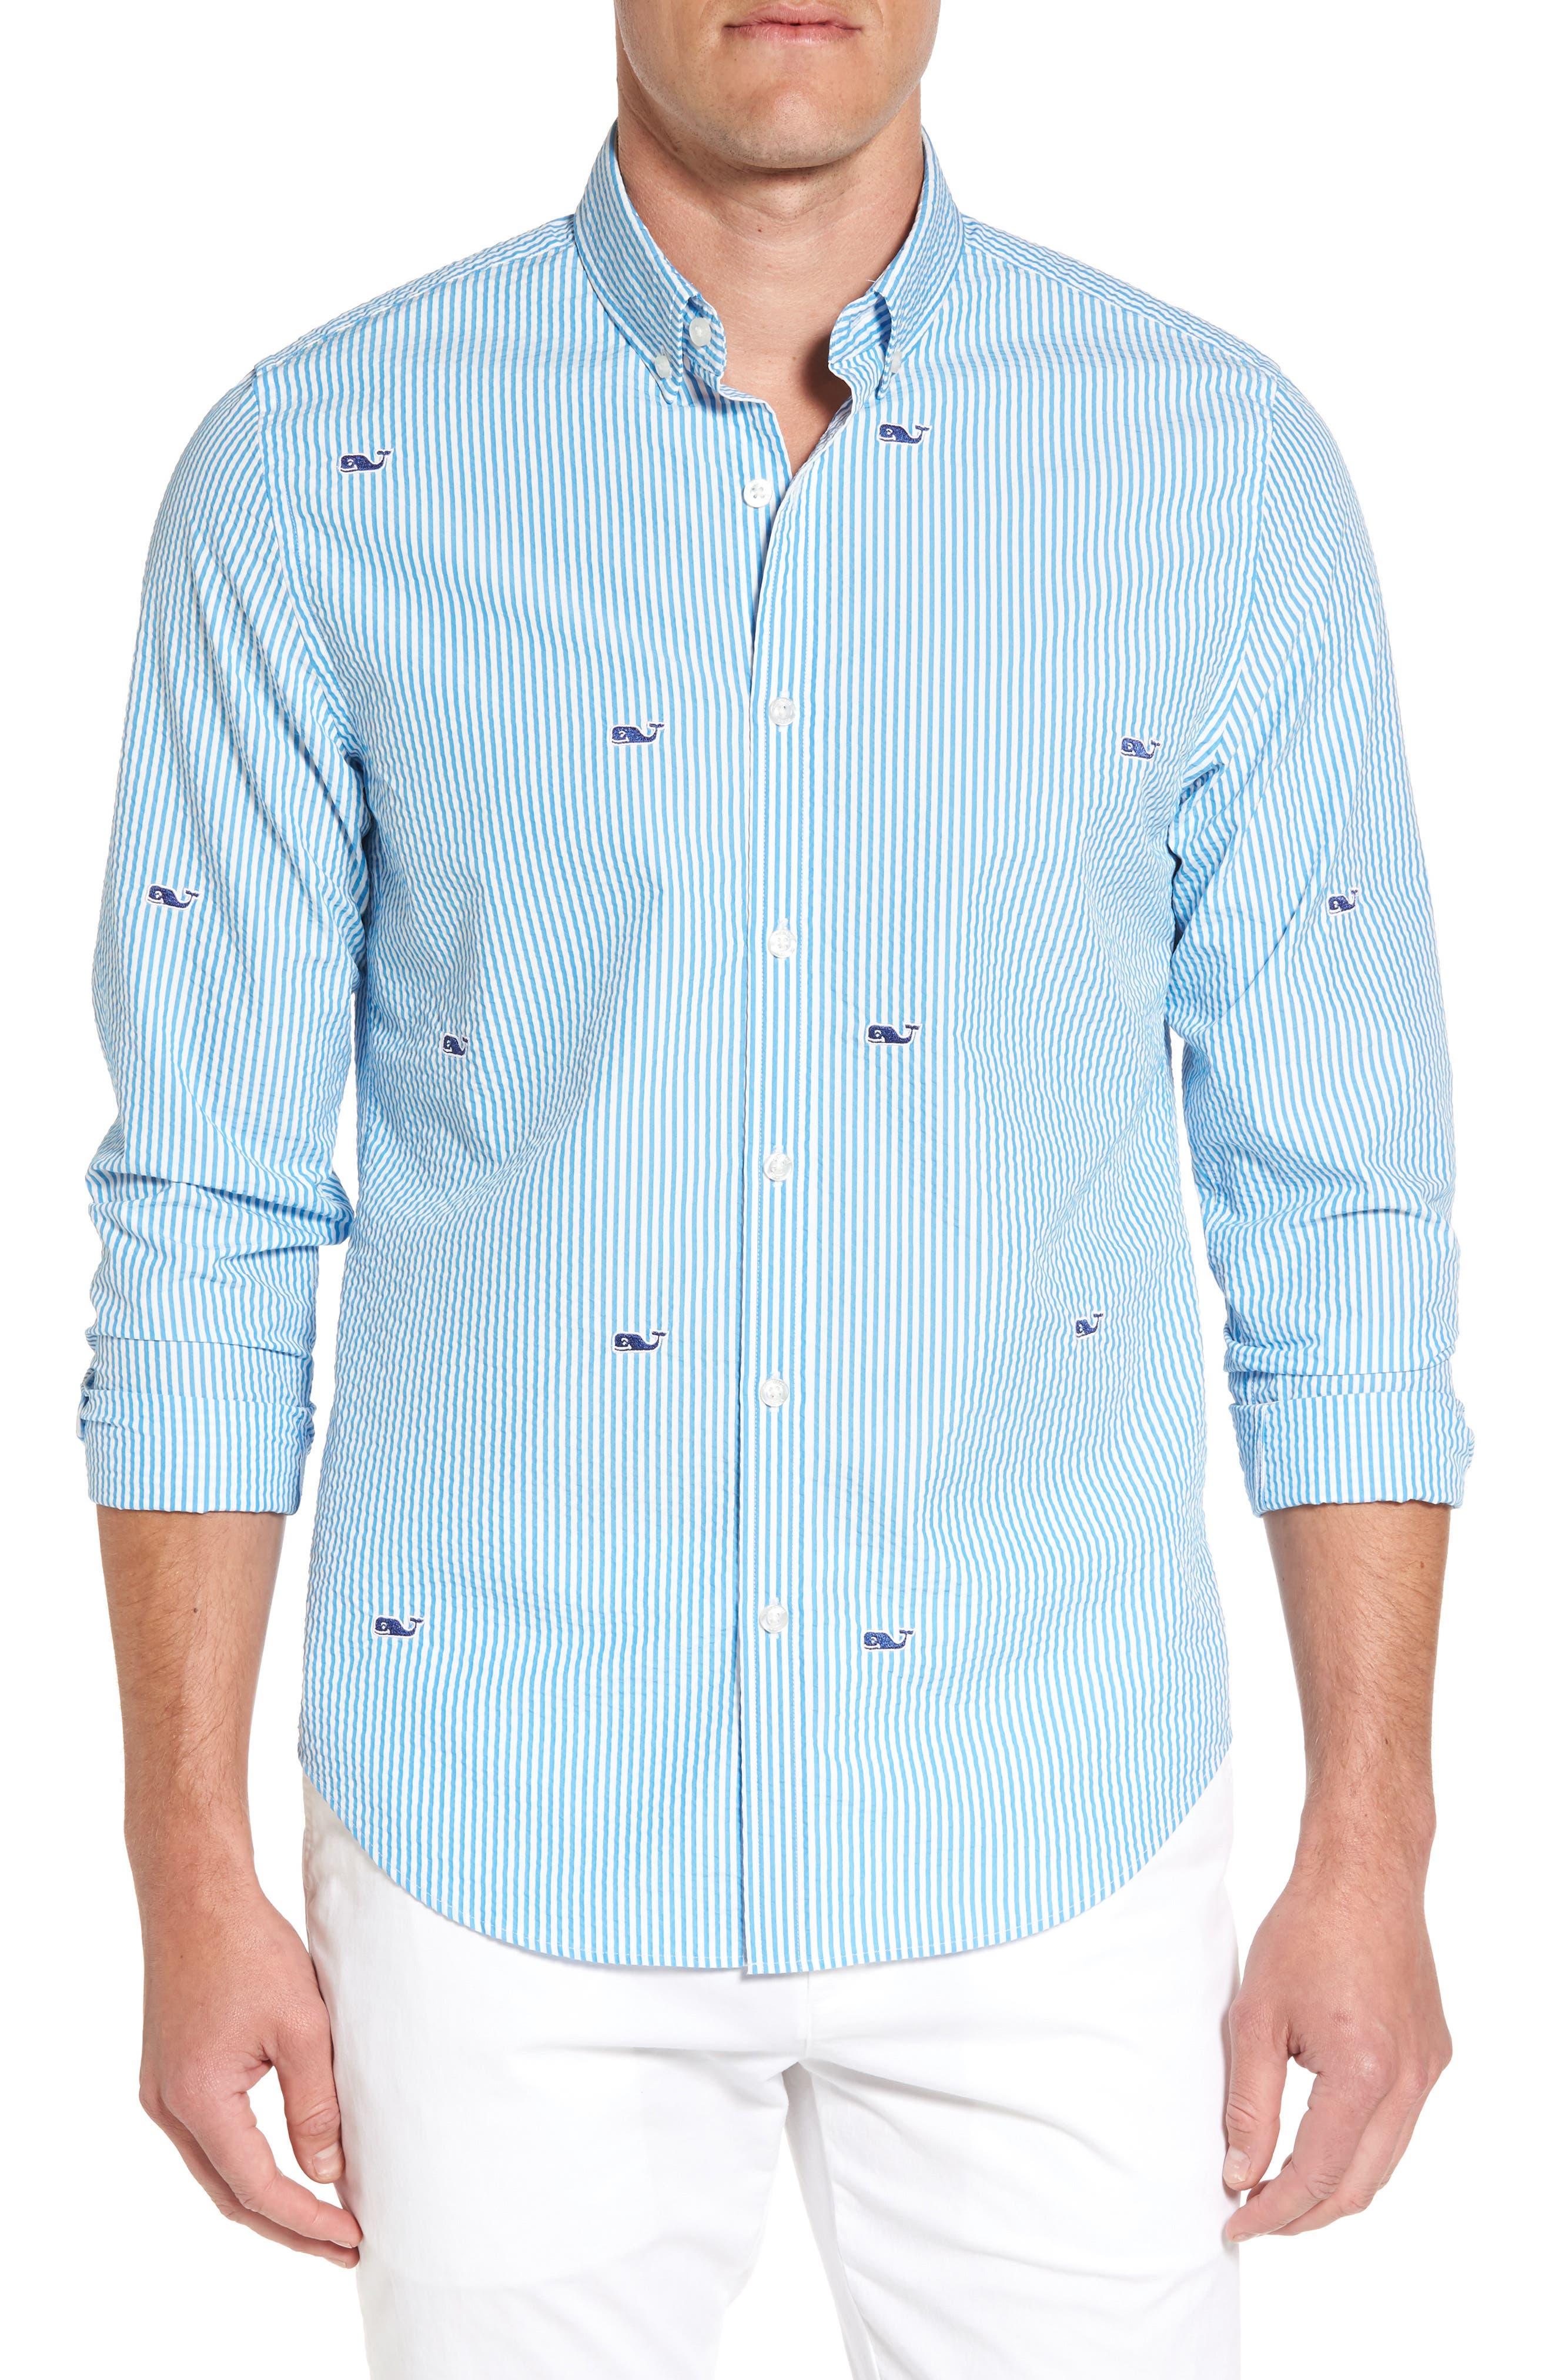 Vineyard Vines Embroidered Seersucker Slim Fit Sport Shirt